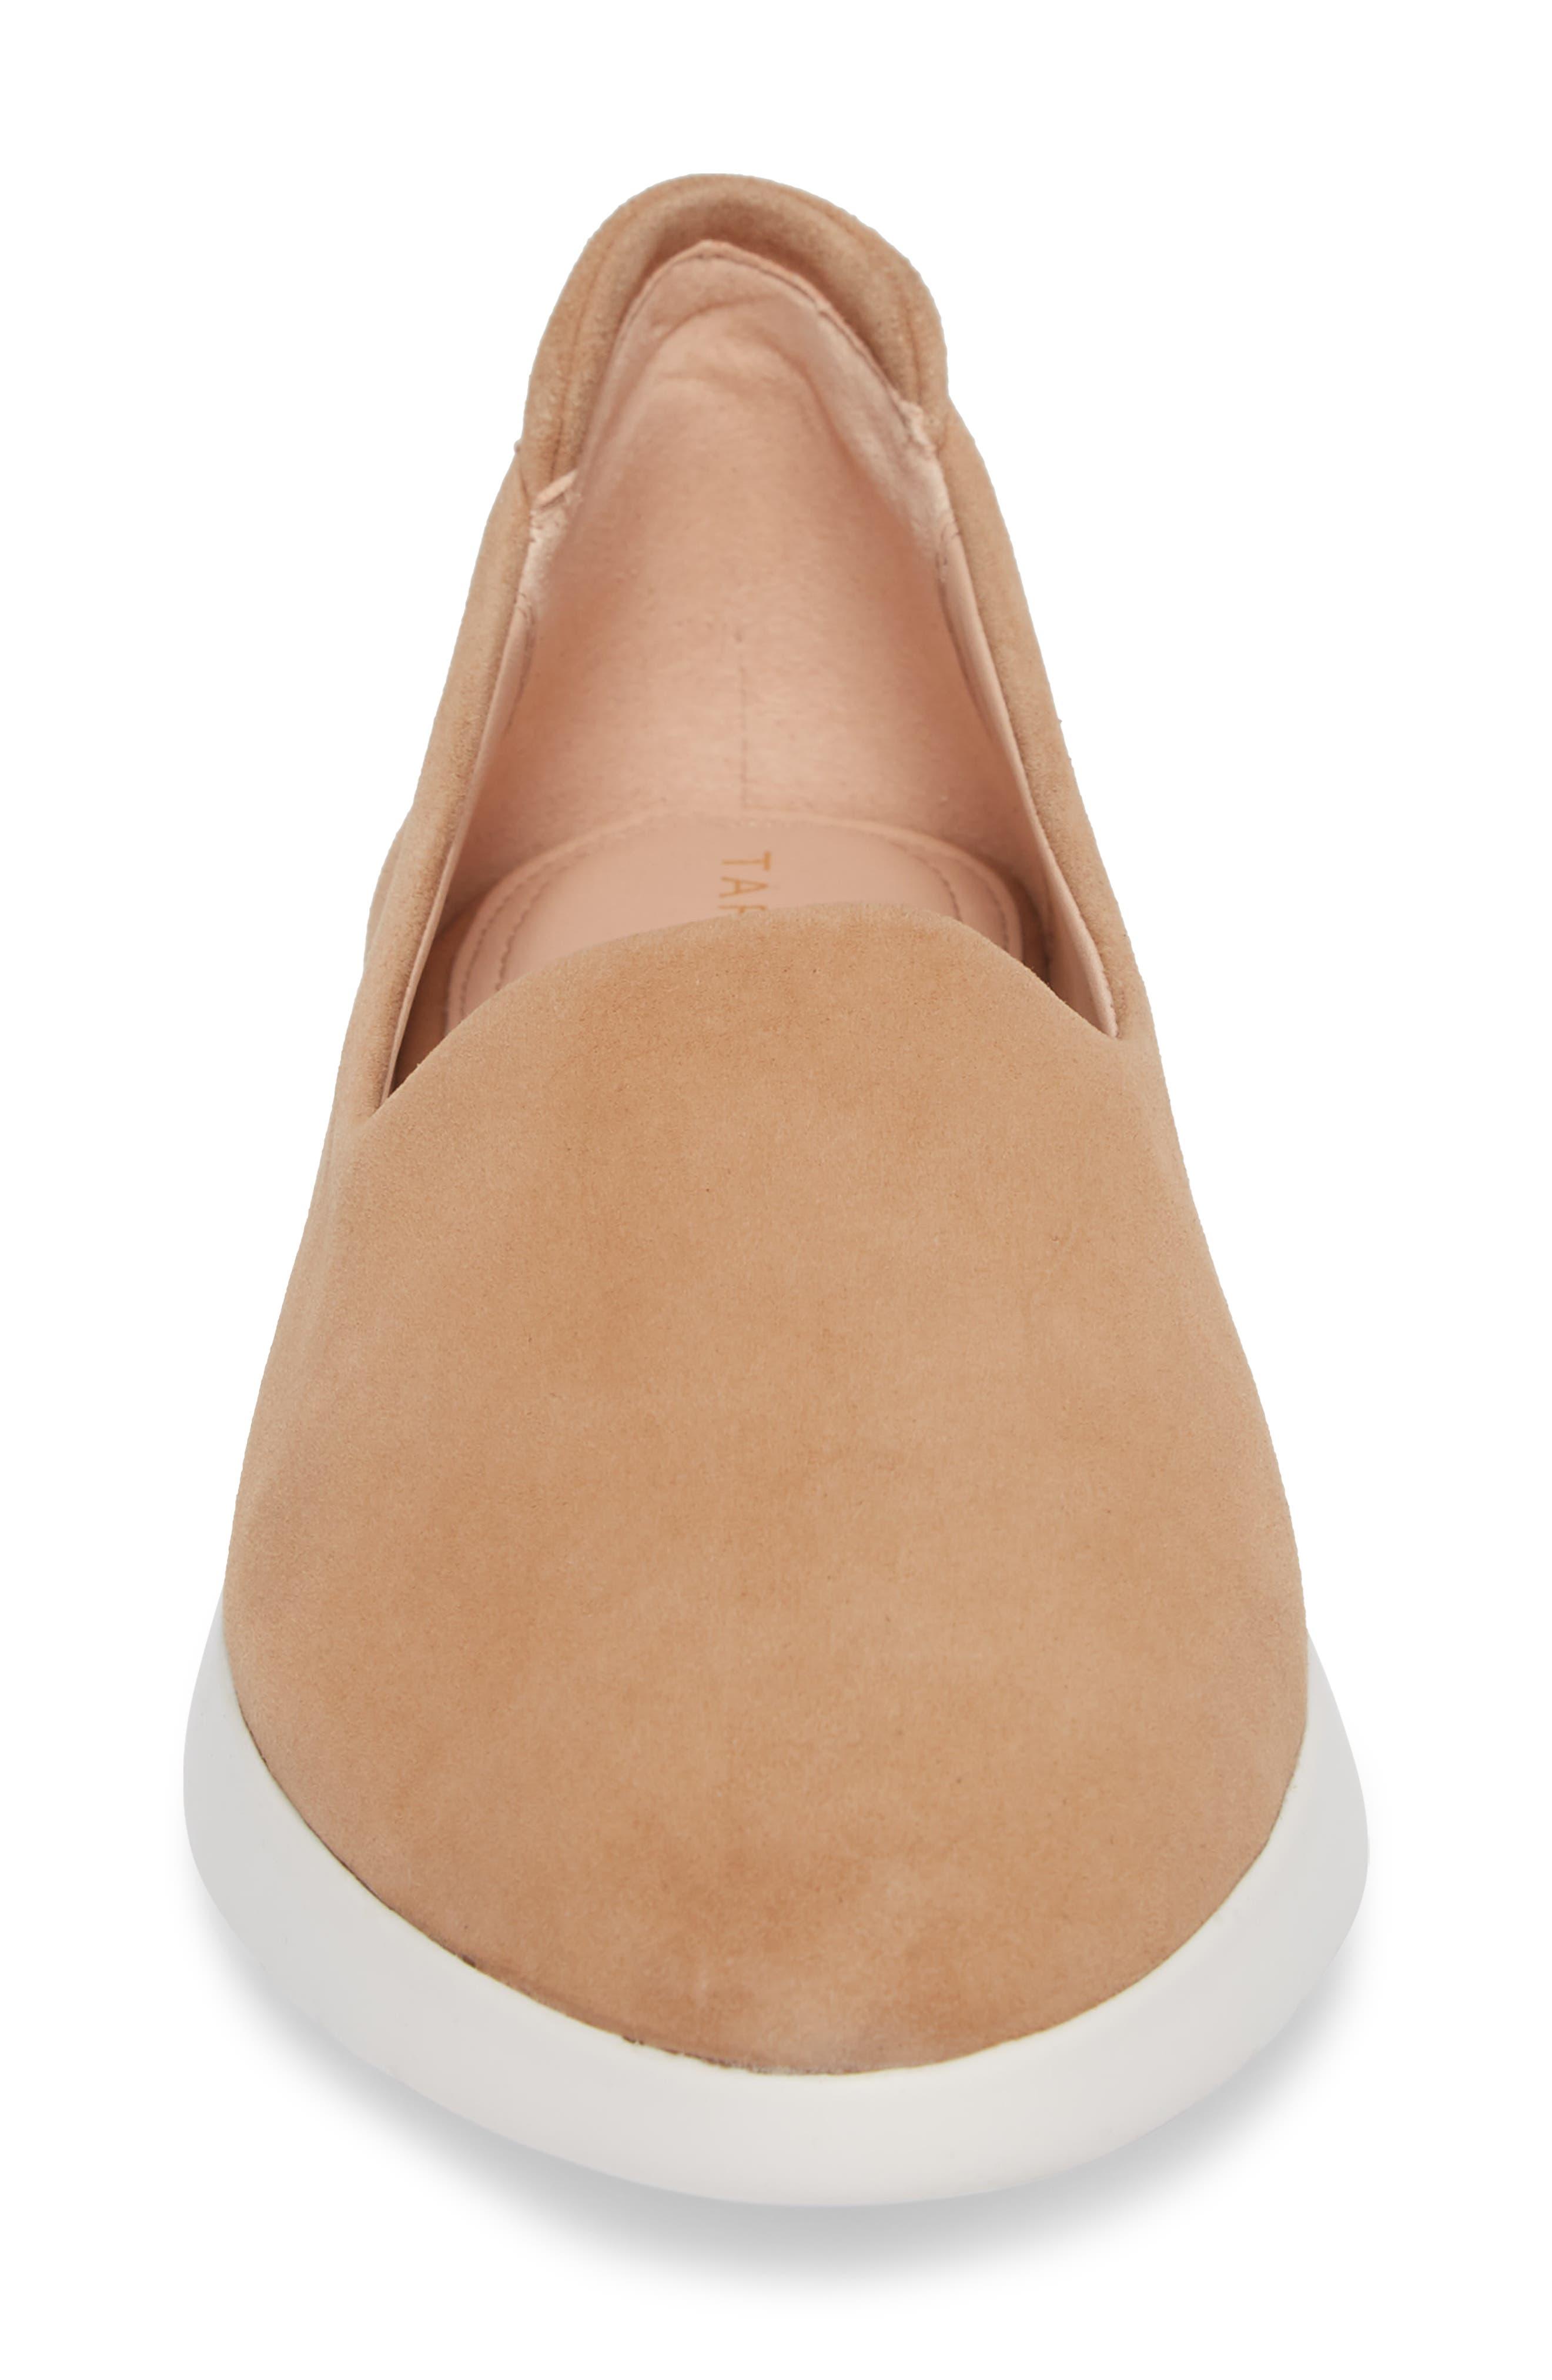 Darla Slip-On Sneaker,                             Alternate thumbnail 4, color,                             SOFT BEIGE SUEDE